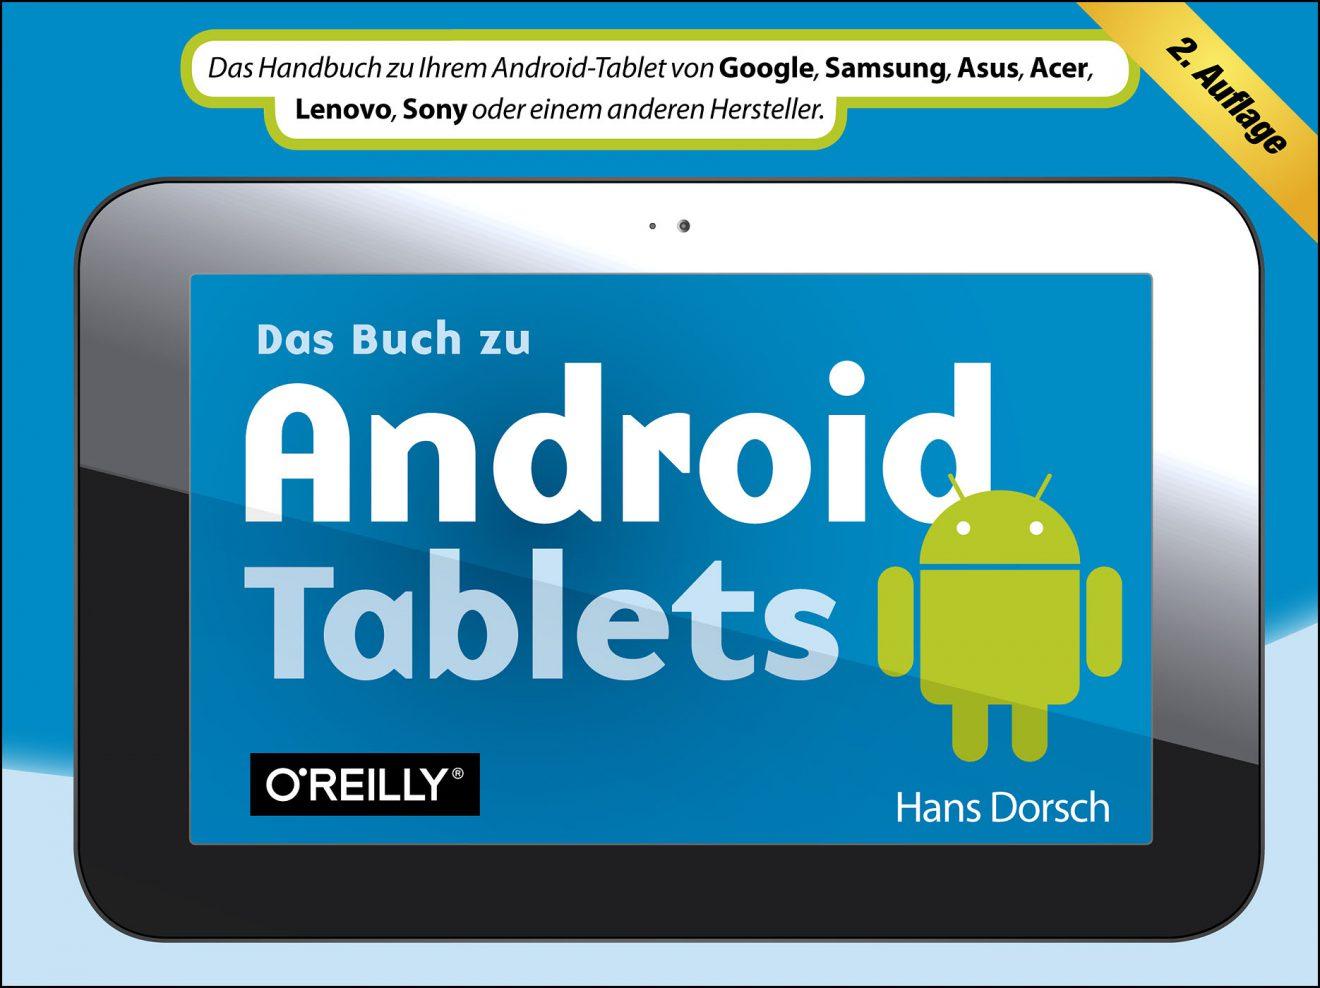 Das Buch zu Android Tablets 2